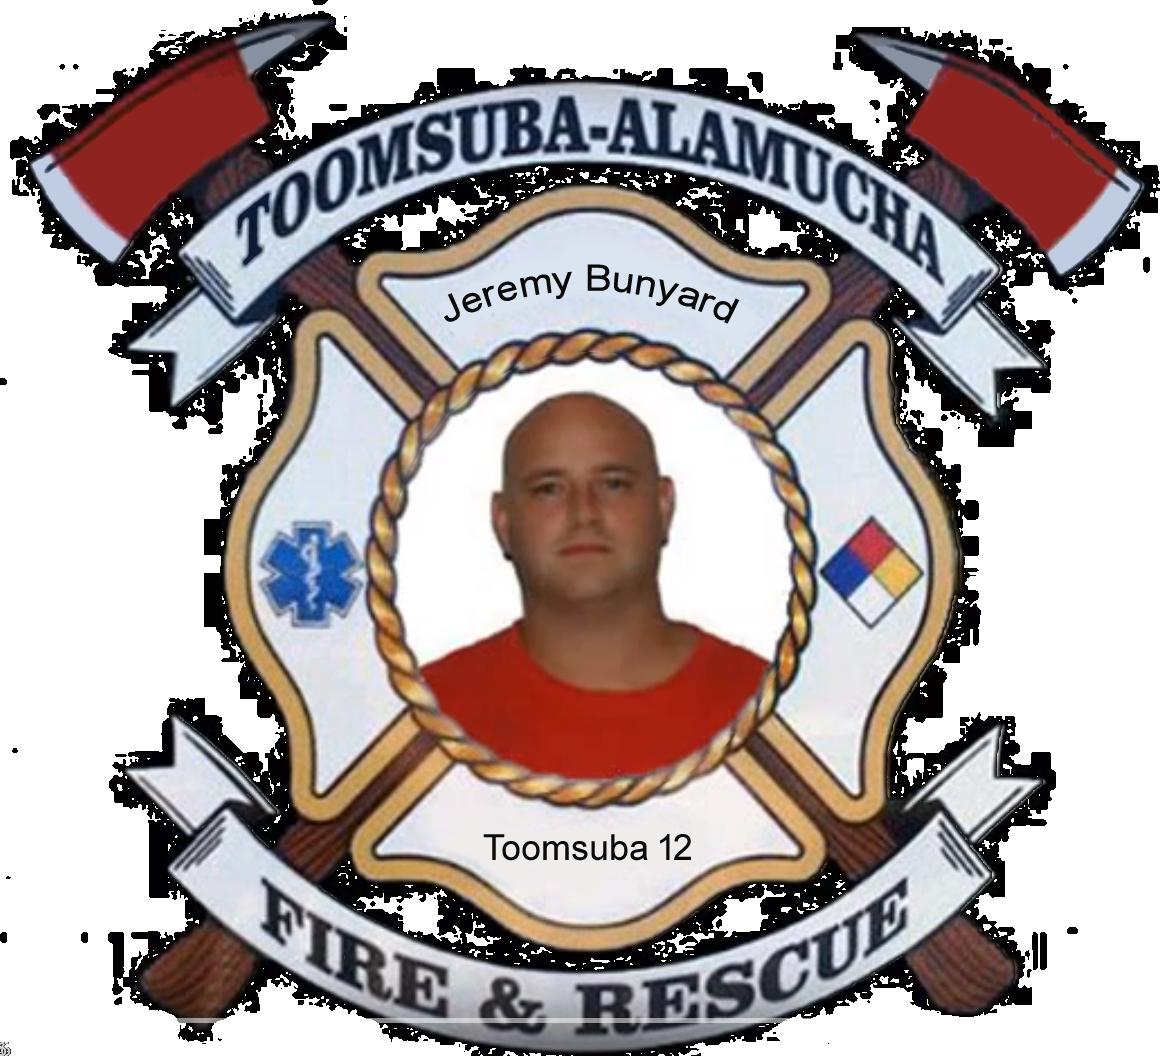 Jeremy Bunyard; Toomsuba Firefighter #12